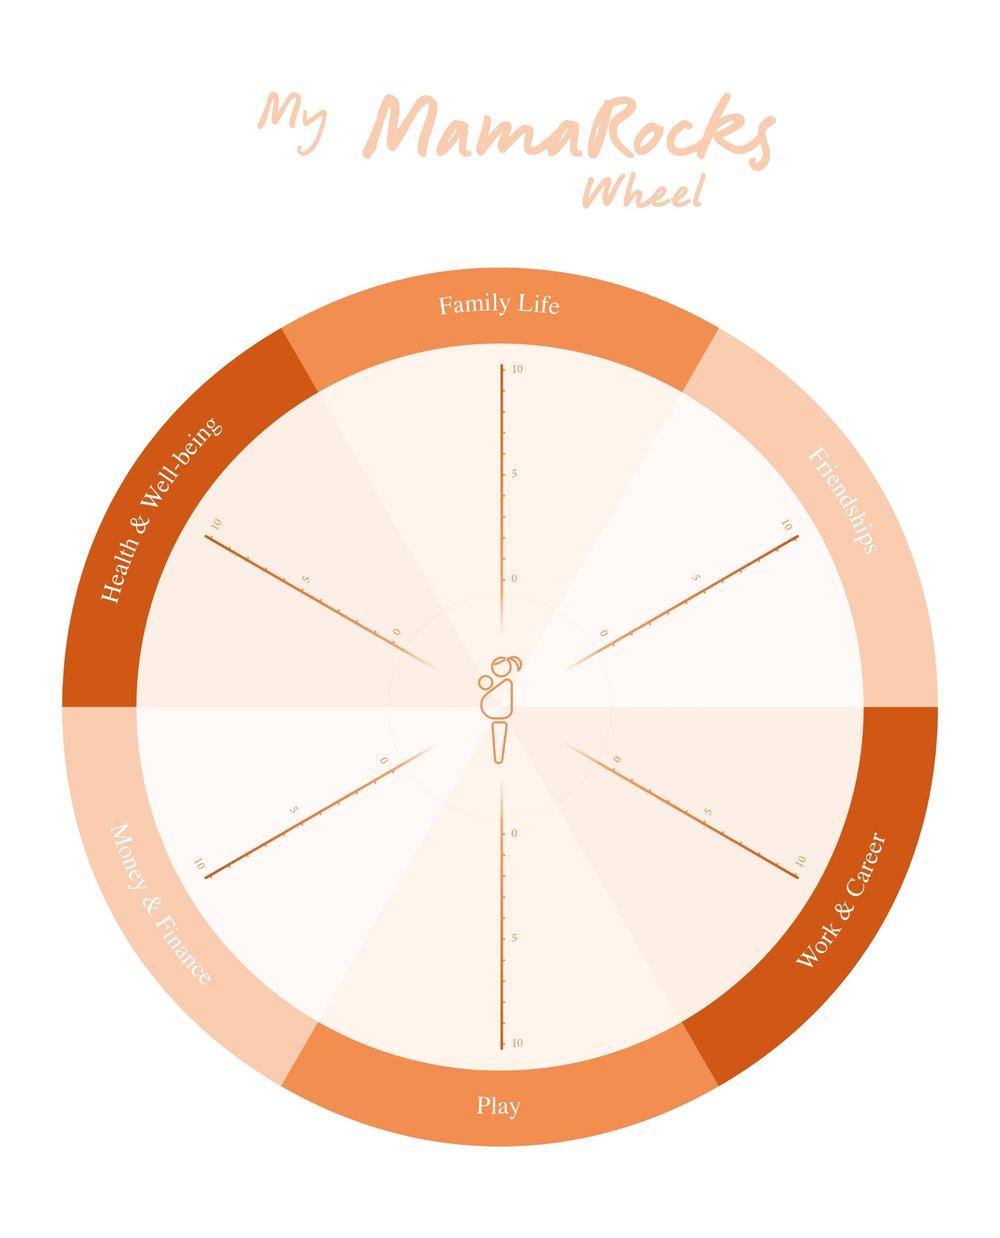 Mamaclub_Mamarocks_wheel_A4_v0.0.2 no background.jpg